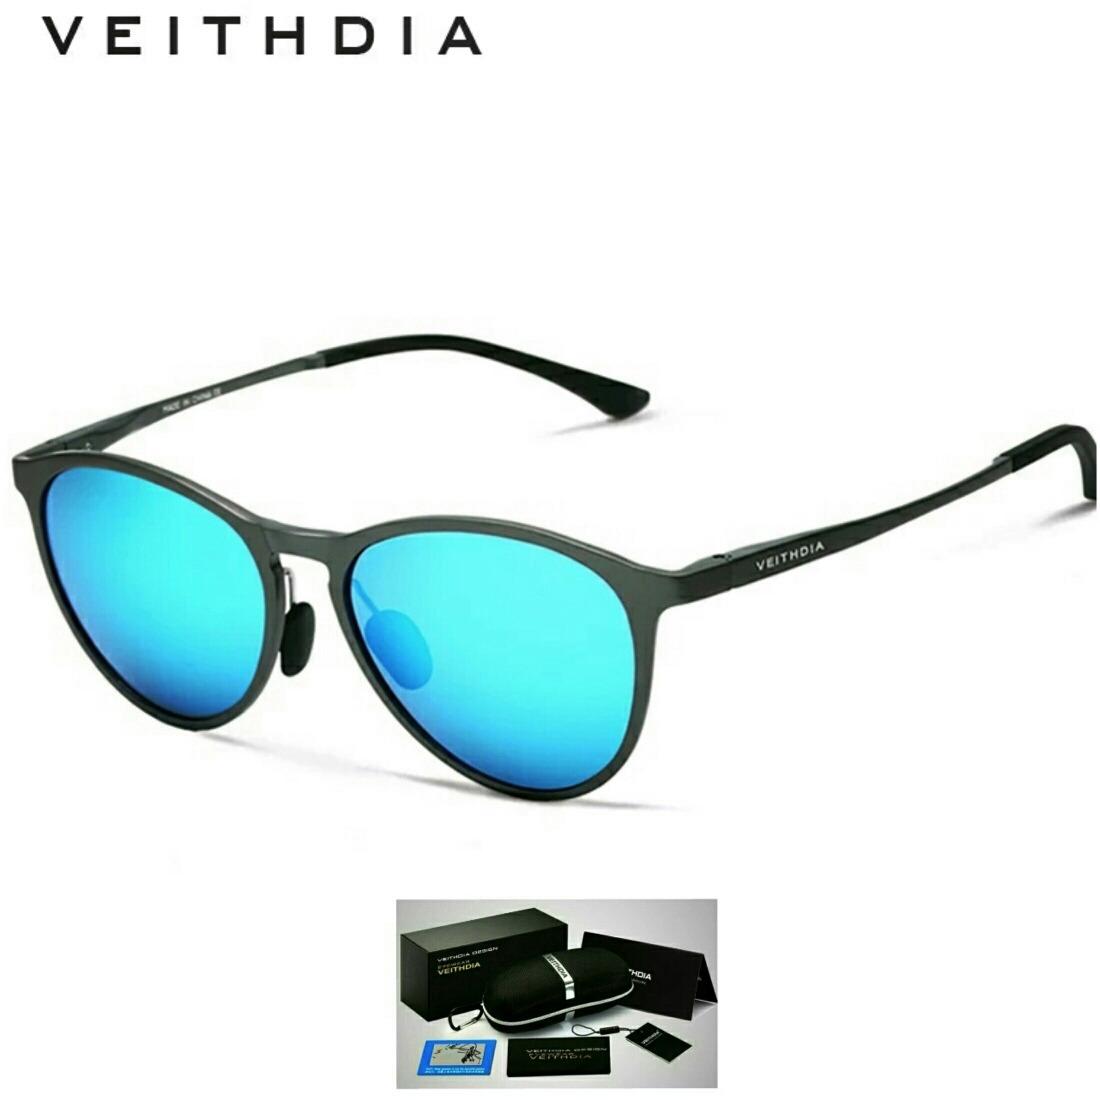 8af0cc36b4064 óculos de sol redondo masculino feminino polarizado veithdia. Carregando  zoom.